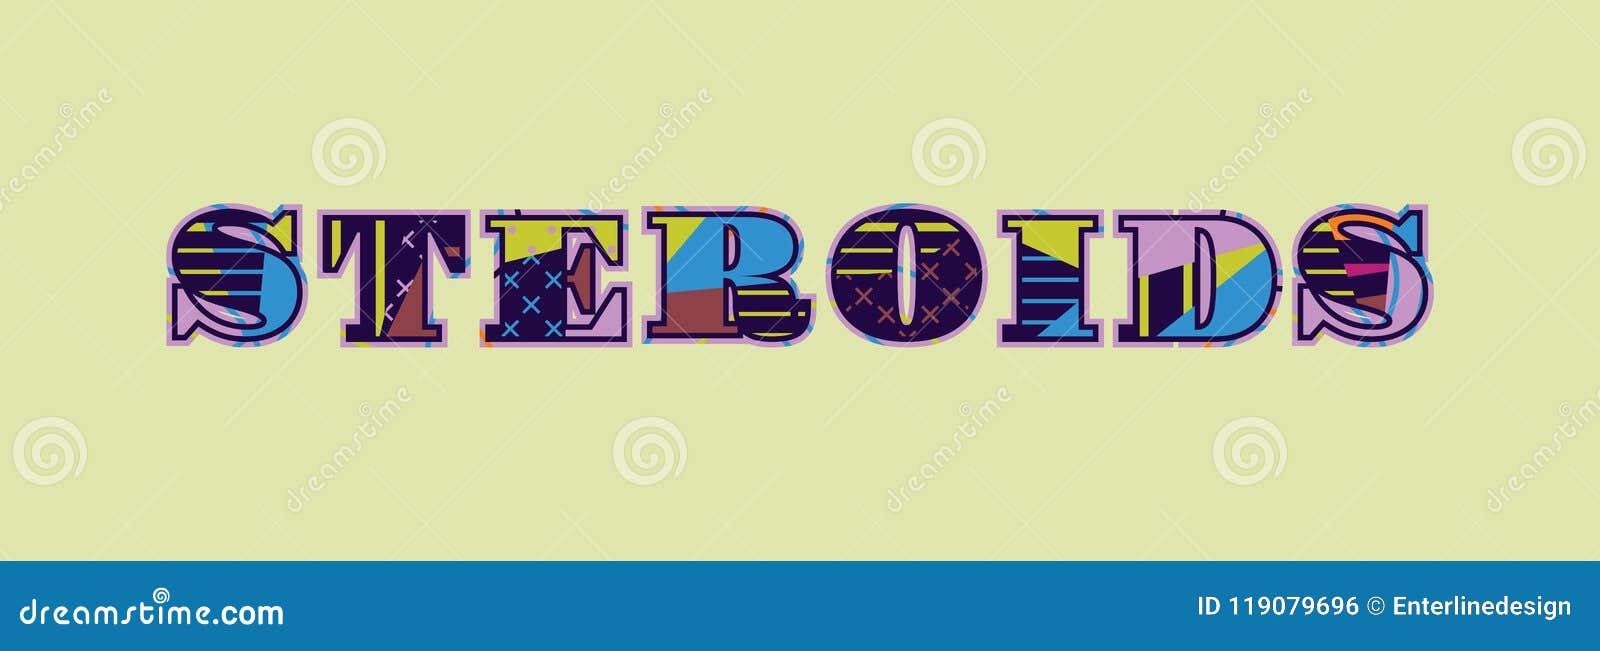 Steroids Concept Word Art Illustration Stock Vector